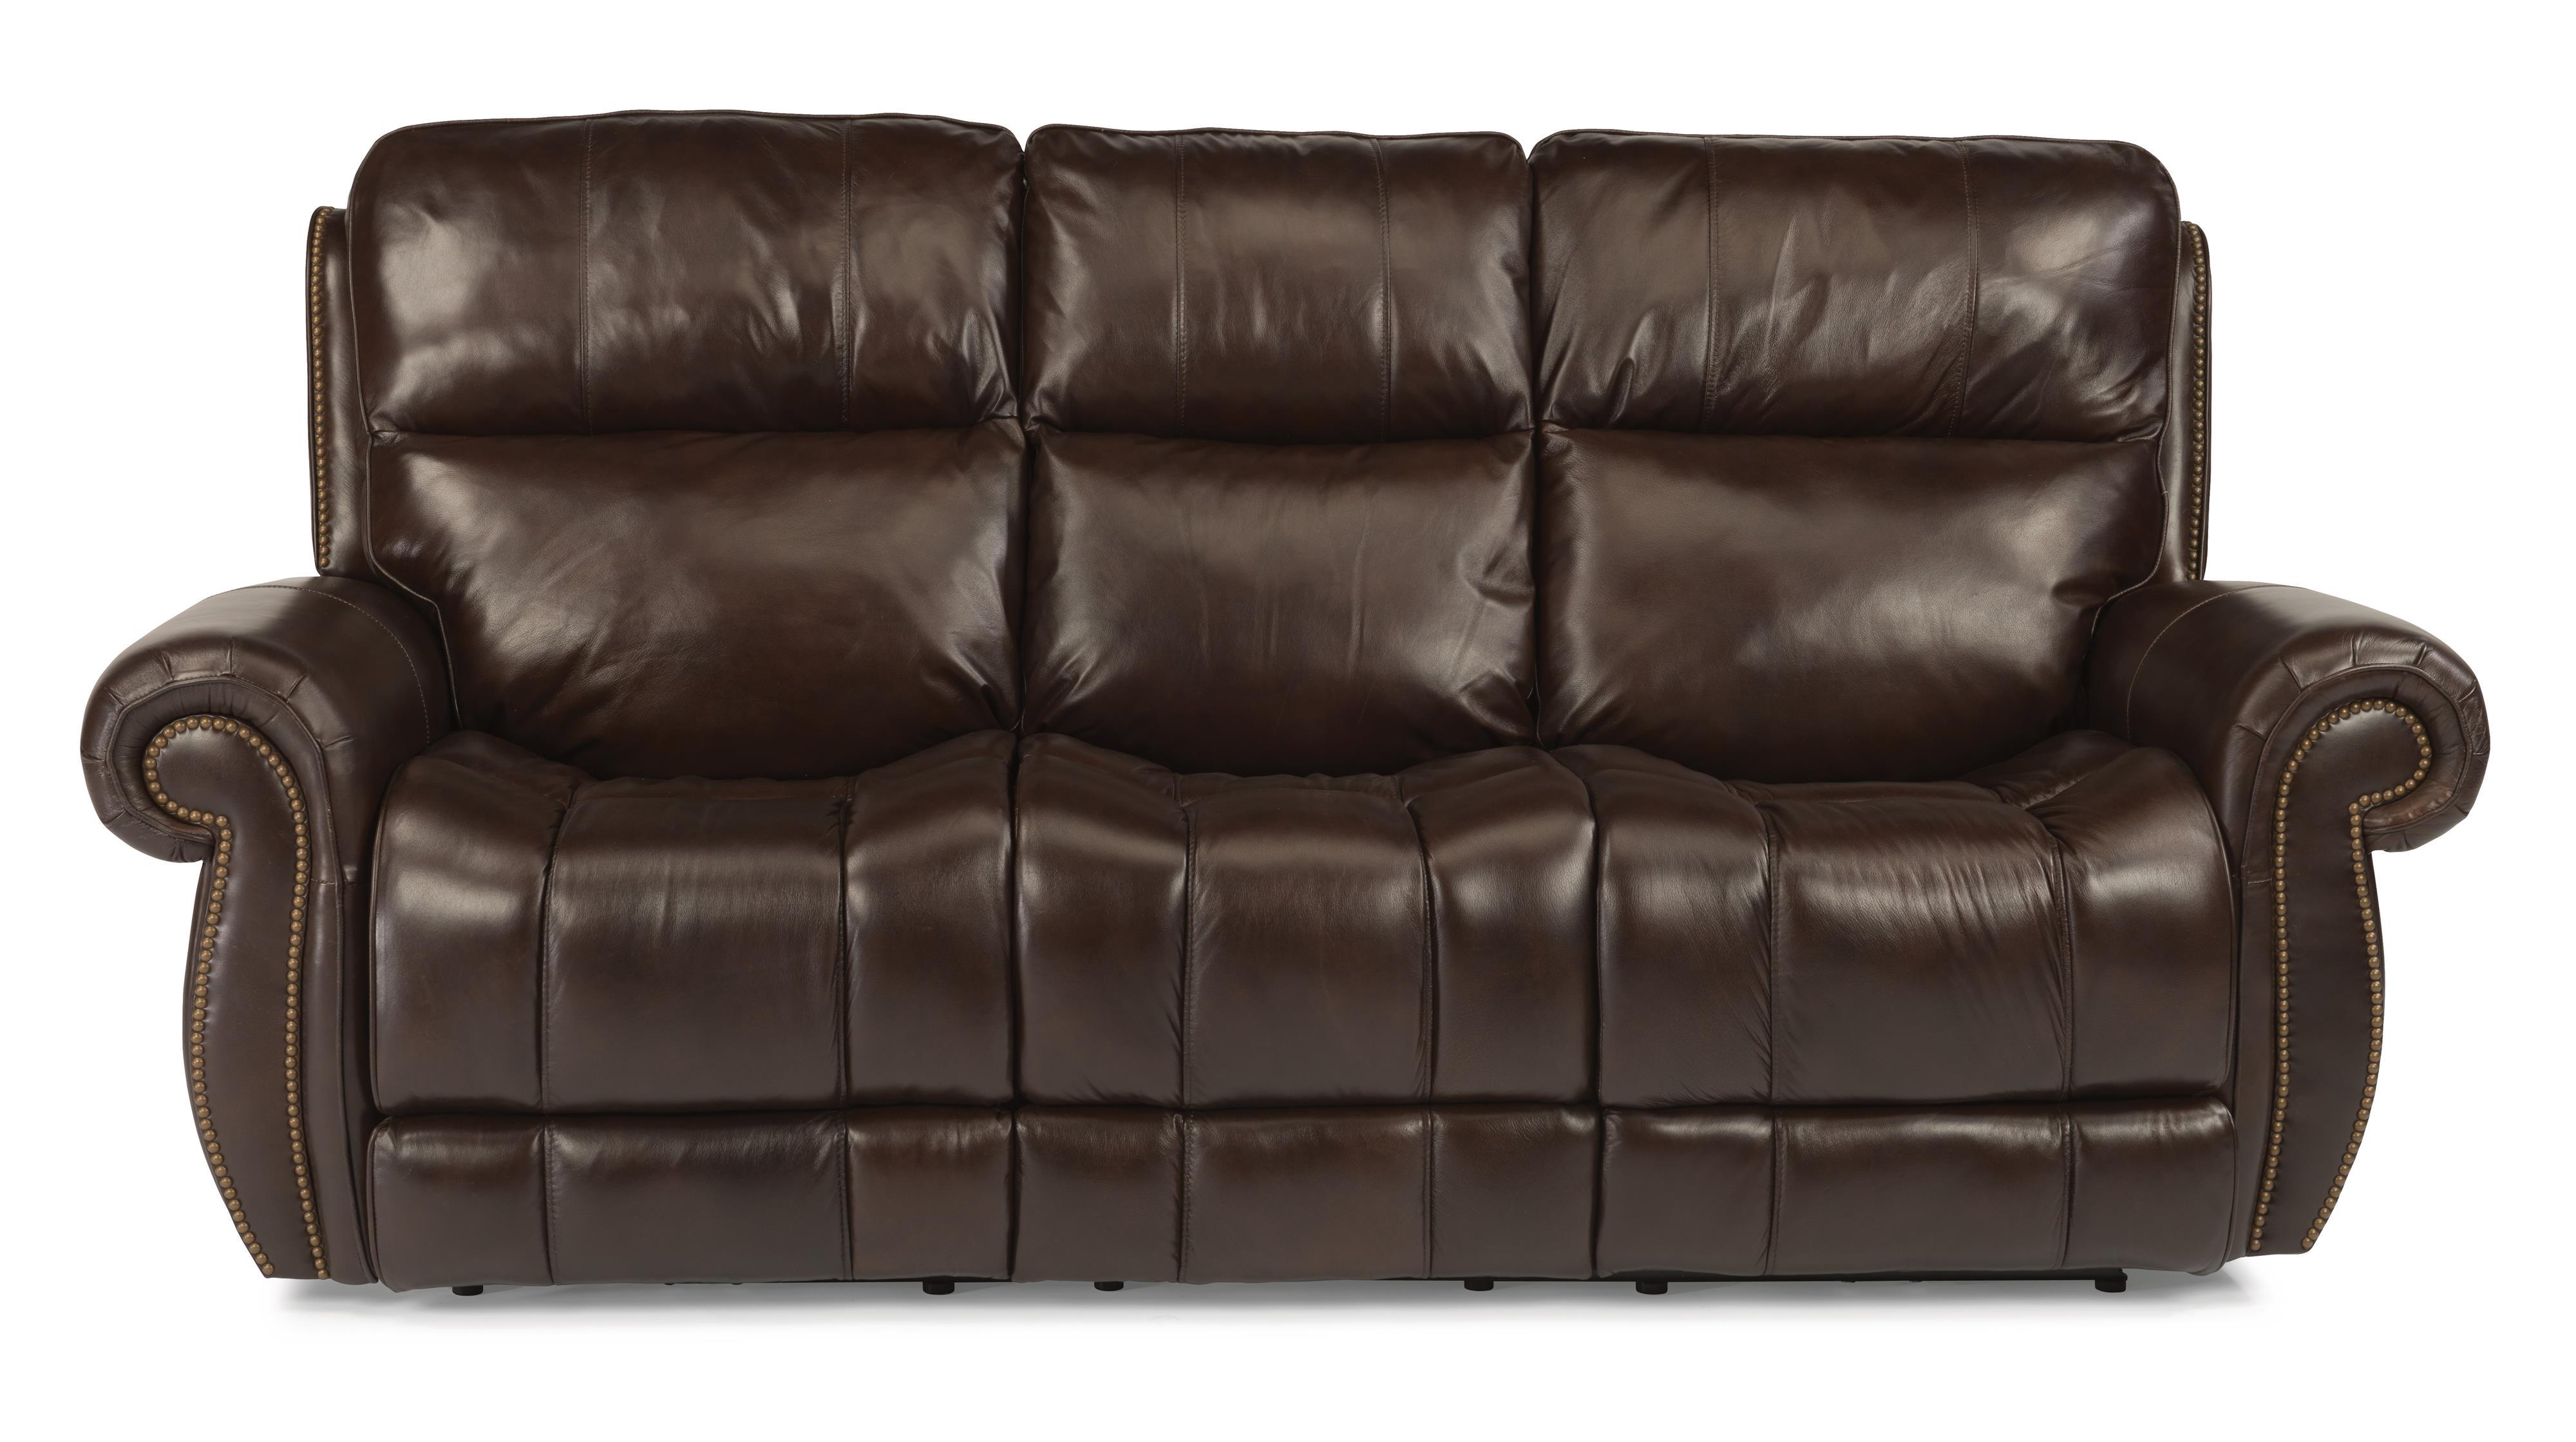 Flexsteel Latitudes - Maxwell Power Reclining Sofa - Item Number: 1603-62P-555-72